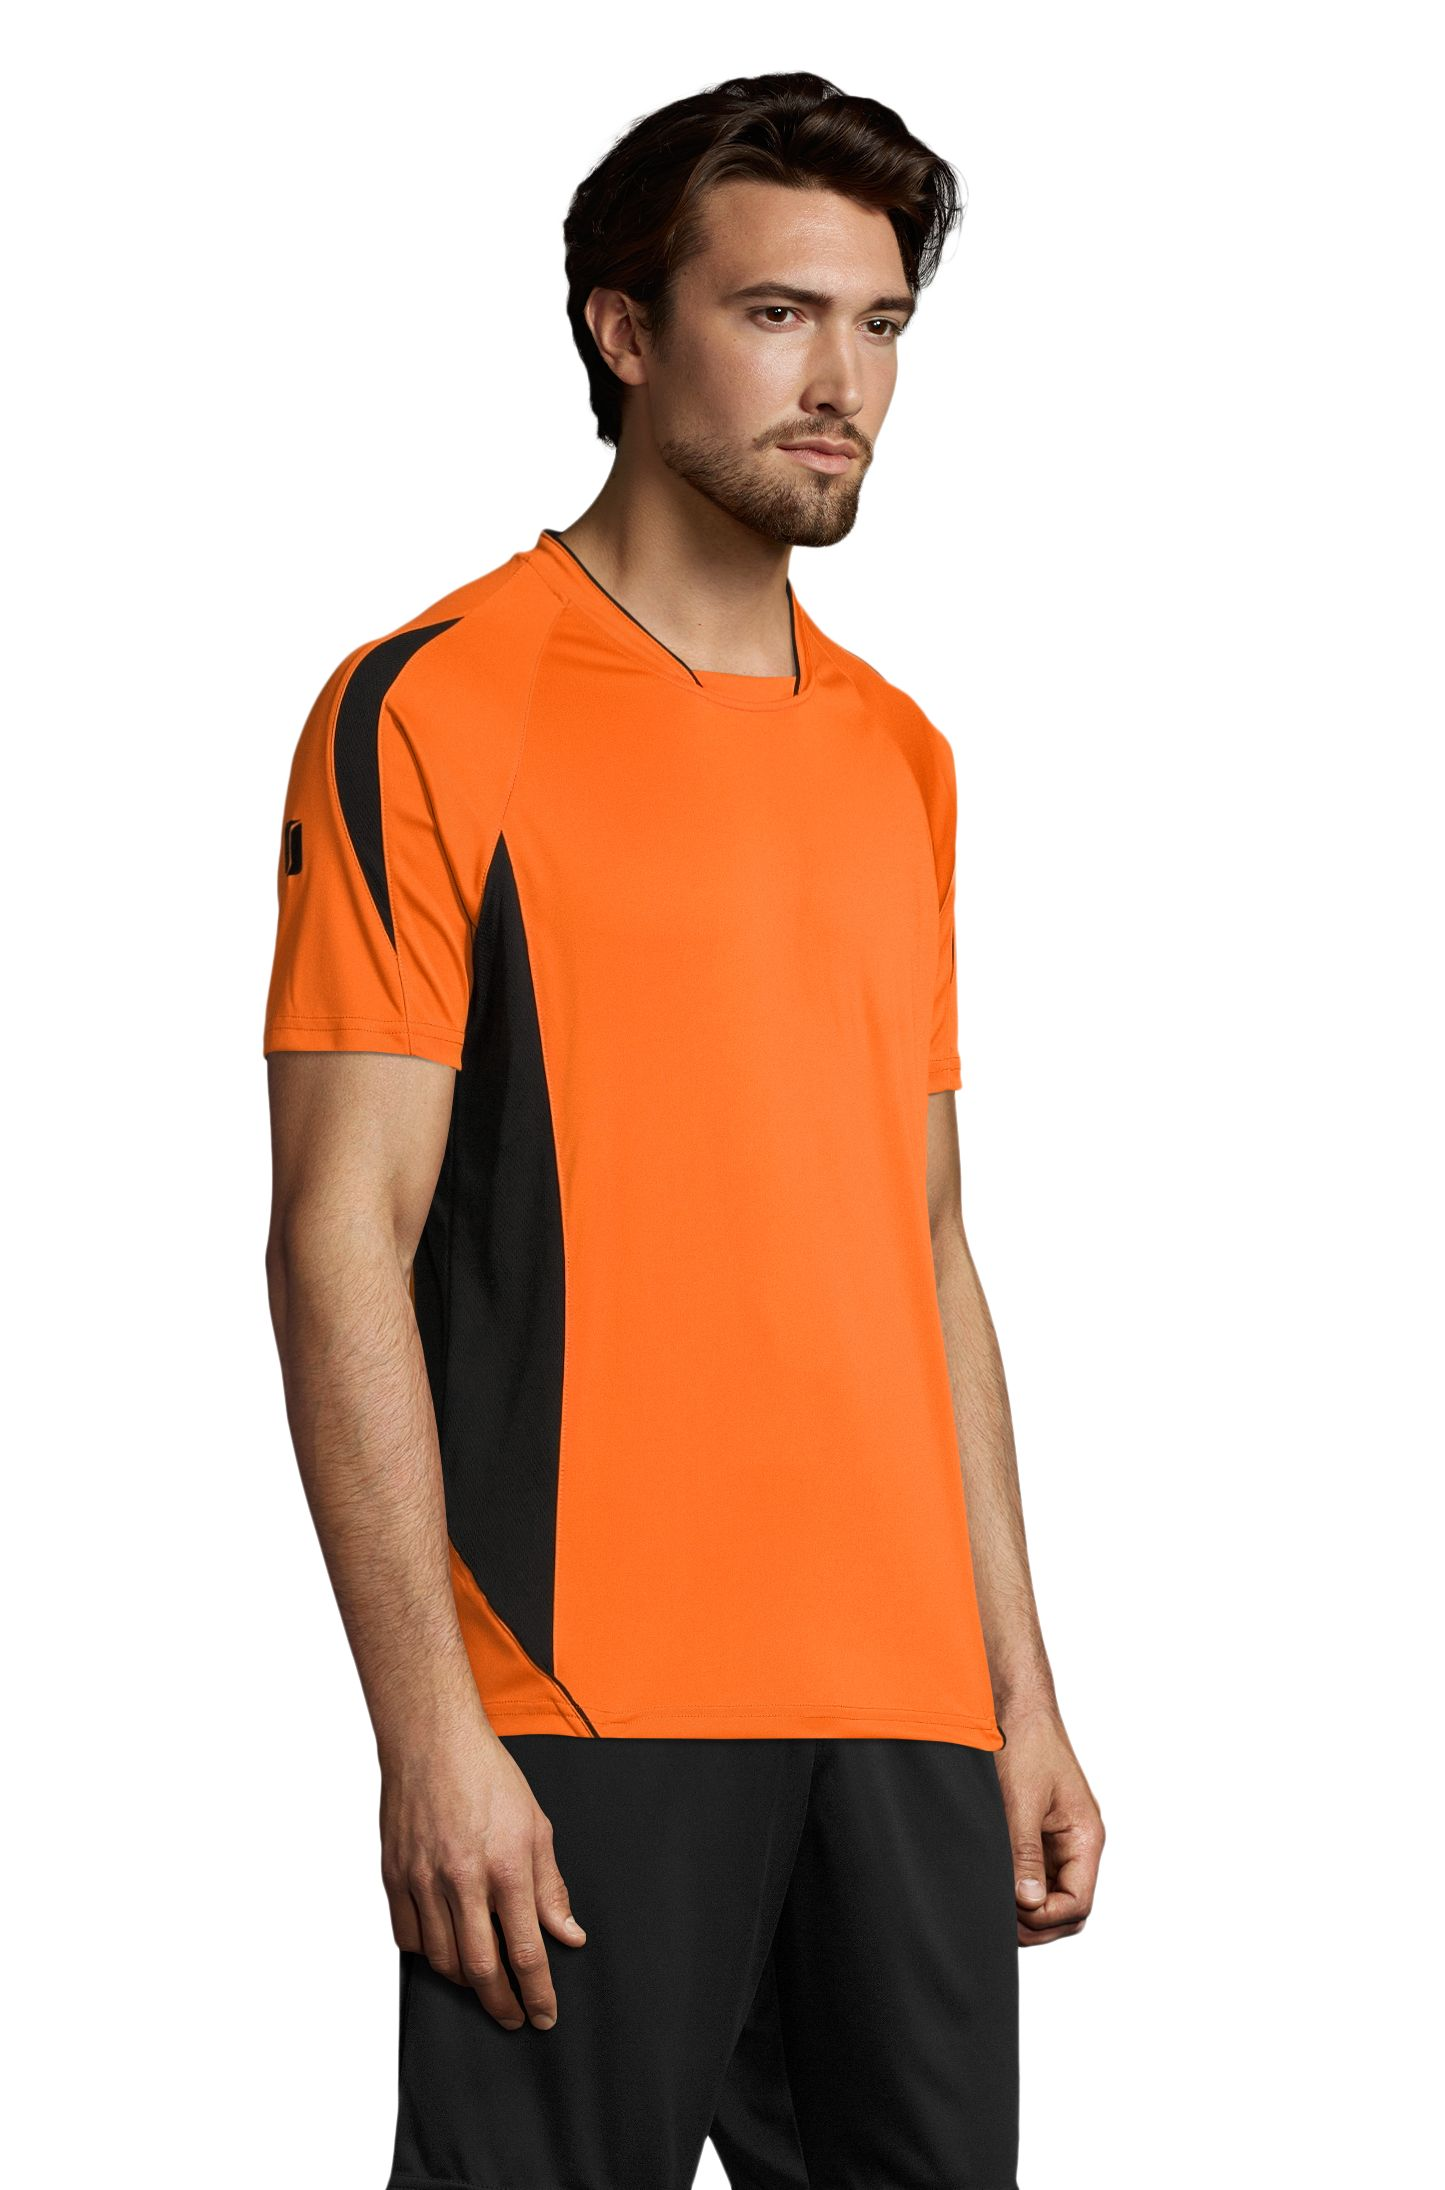 938 - Orange / Noir